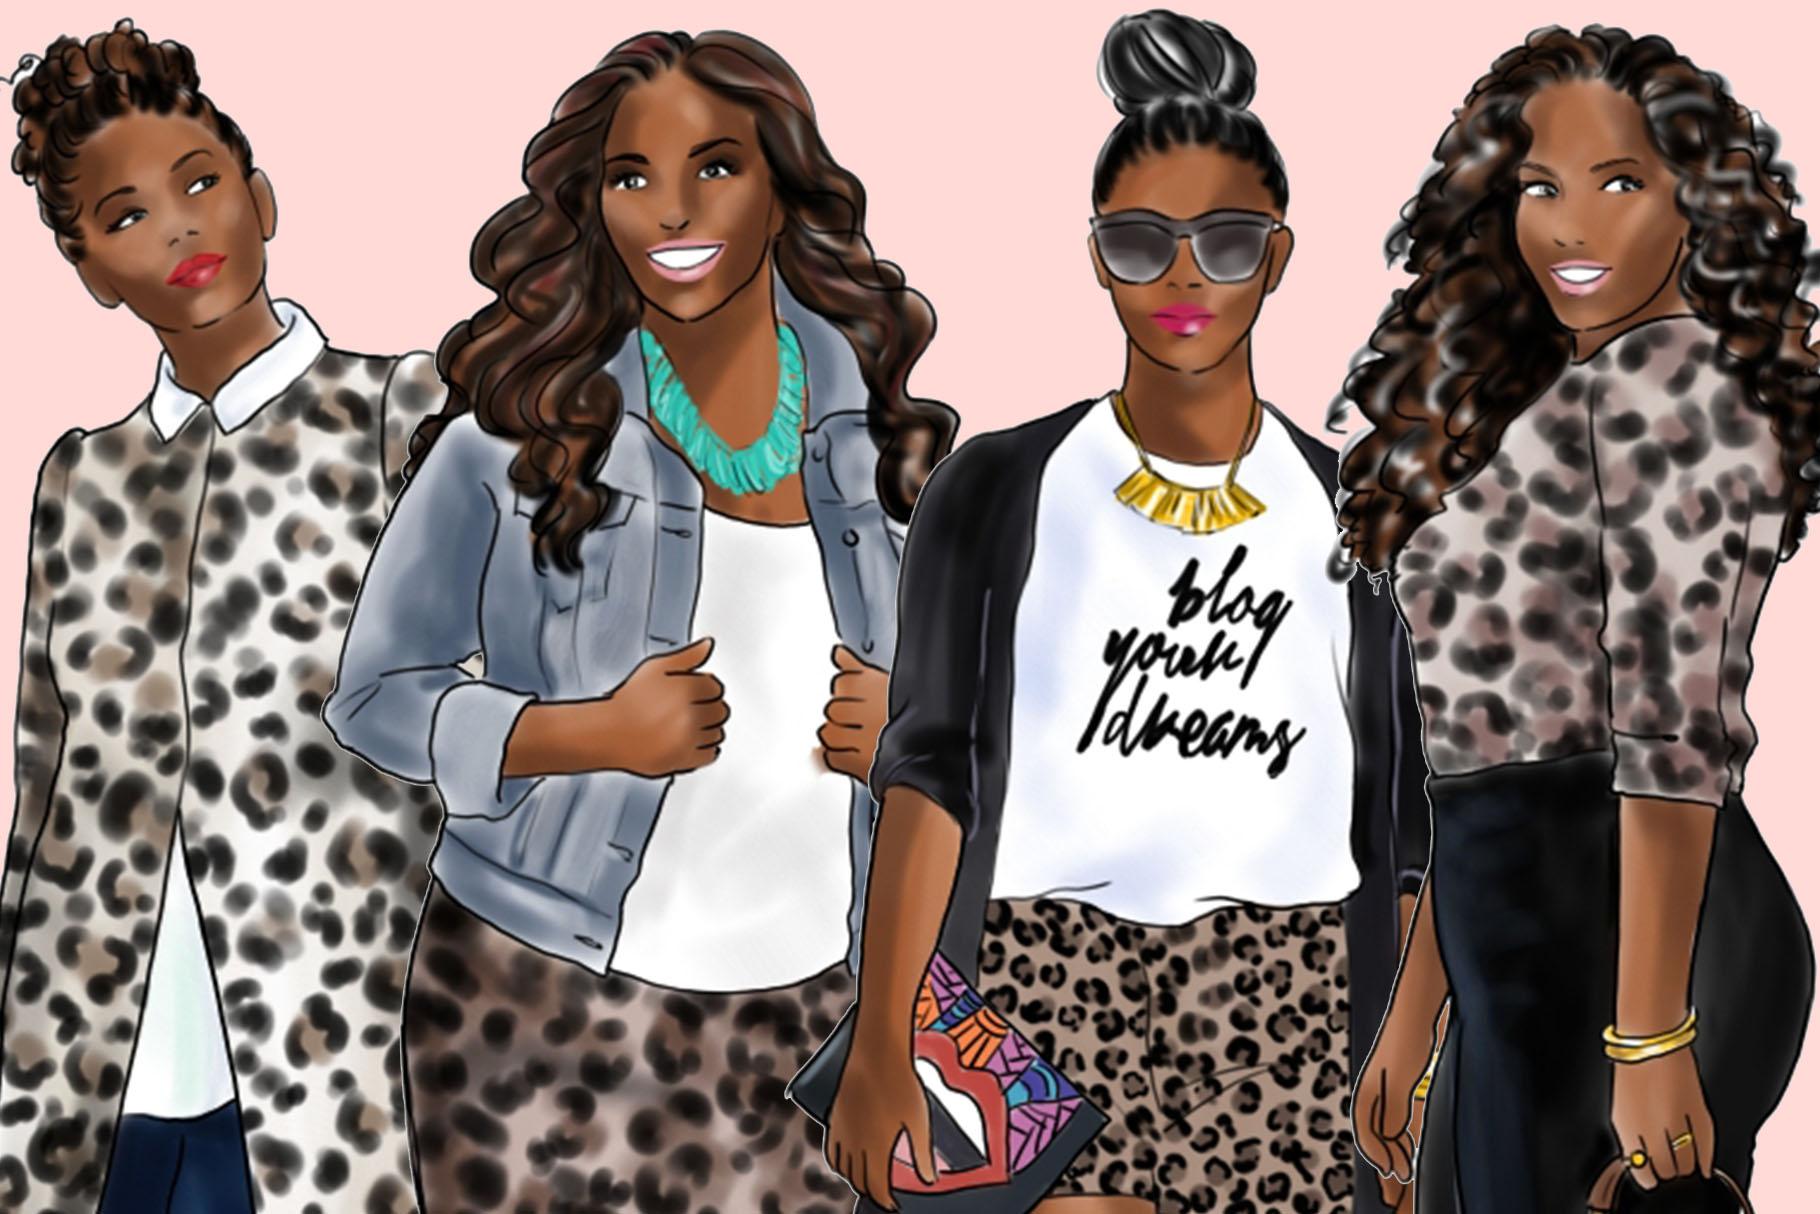 Fashion clipart - Curvy Girls in Animal Print - Dark Skin example image 3